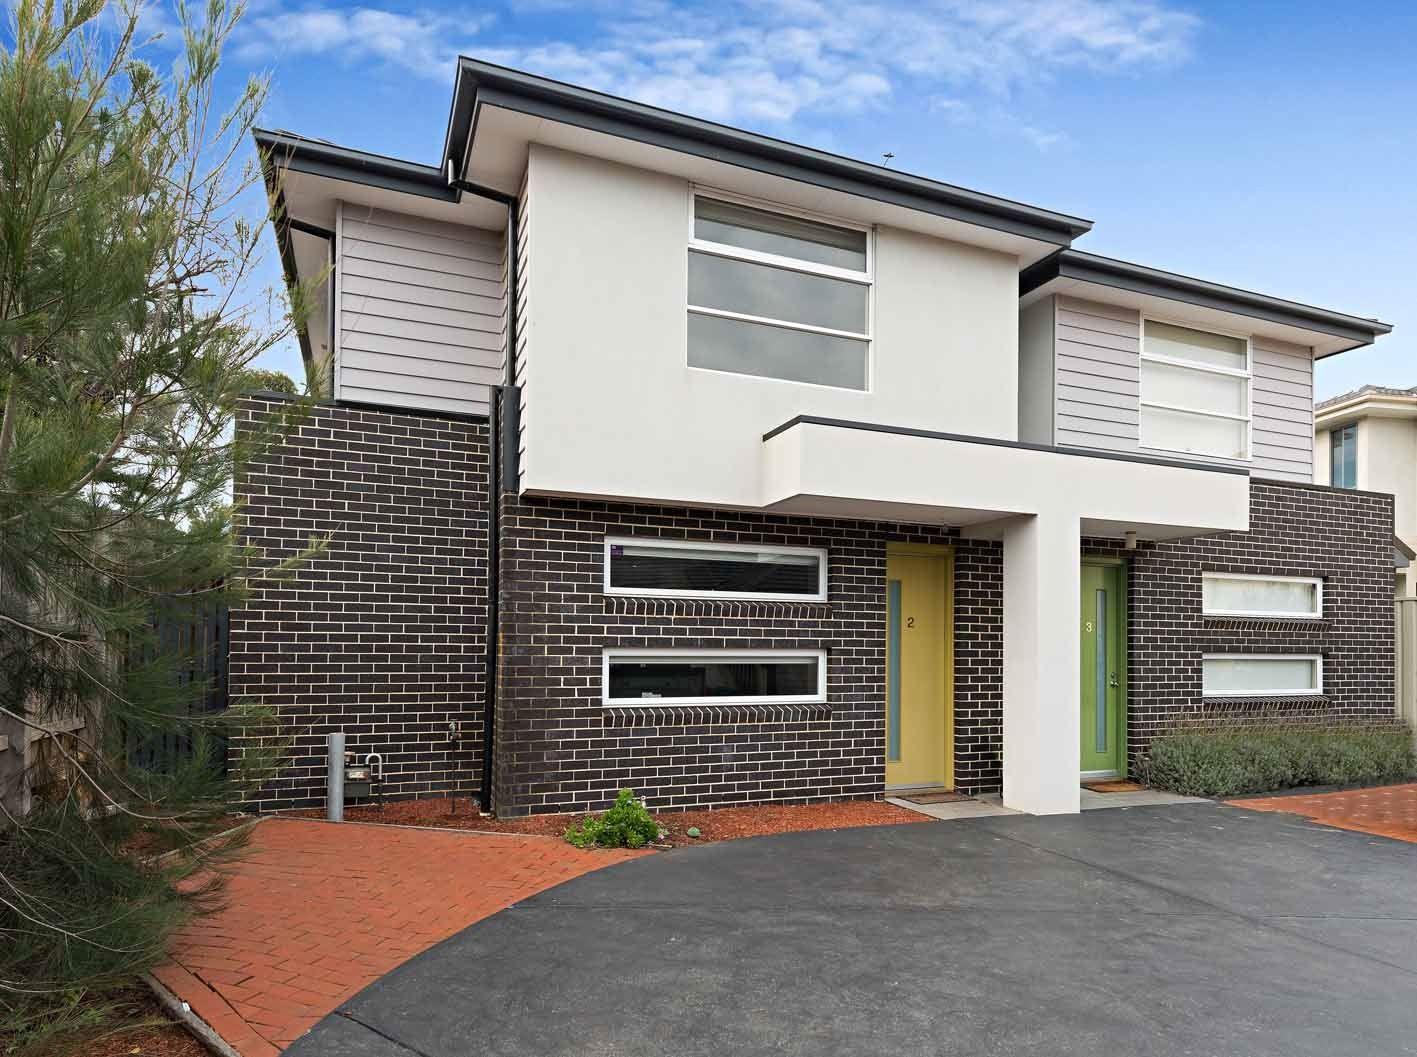 2/48 Elizabeth Street, Coburg VIC 3058, Image 0